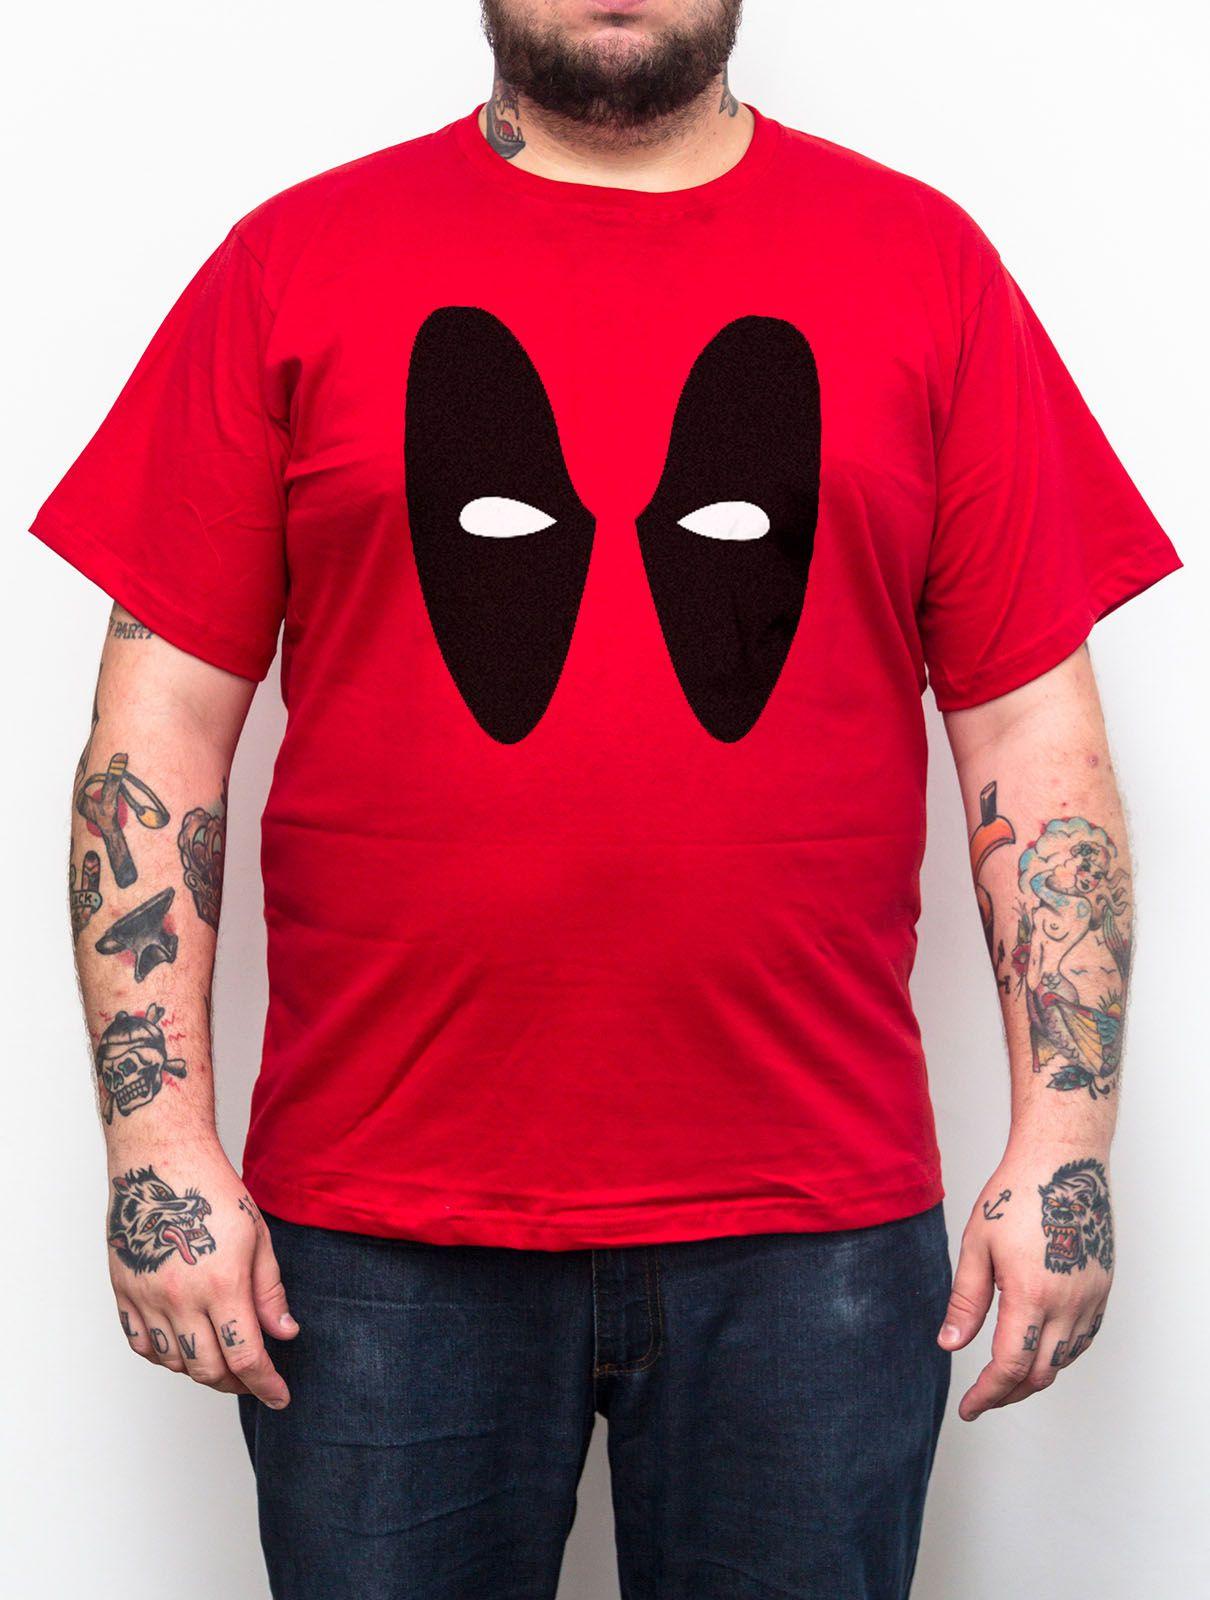 Camiseta Plus Size Deadpool Vermelho - Tamanho XG  - HShop